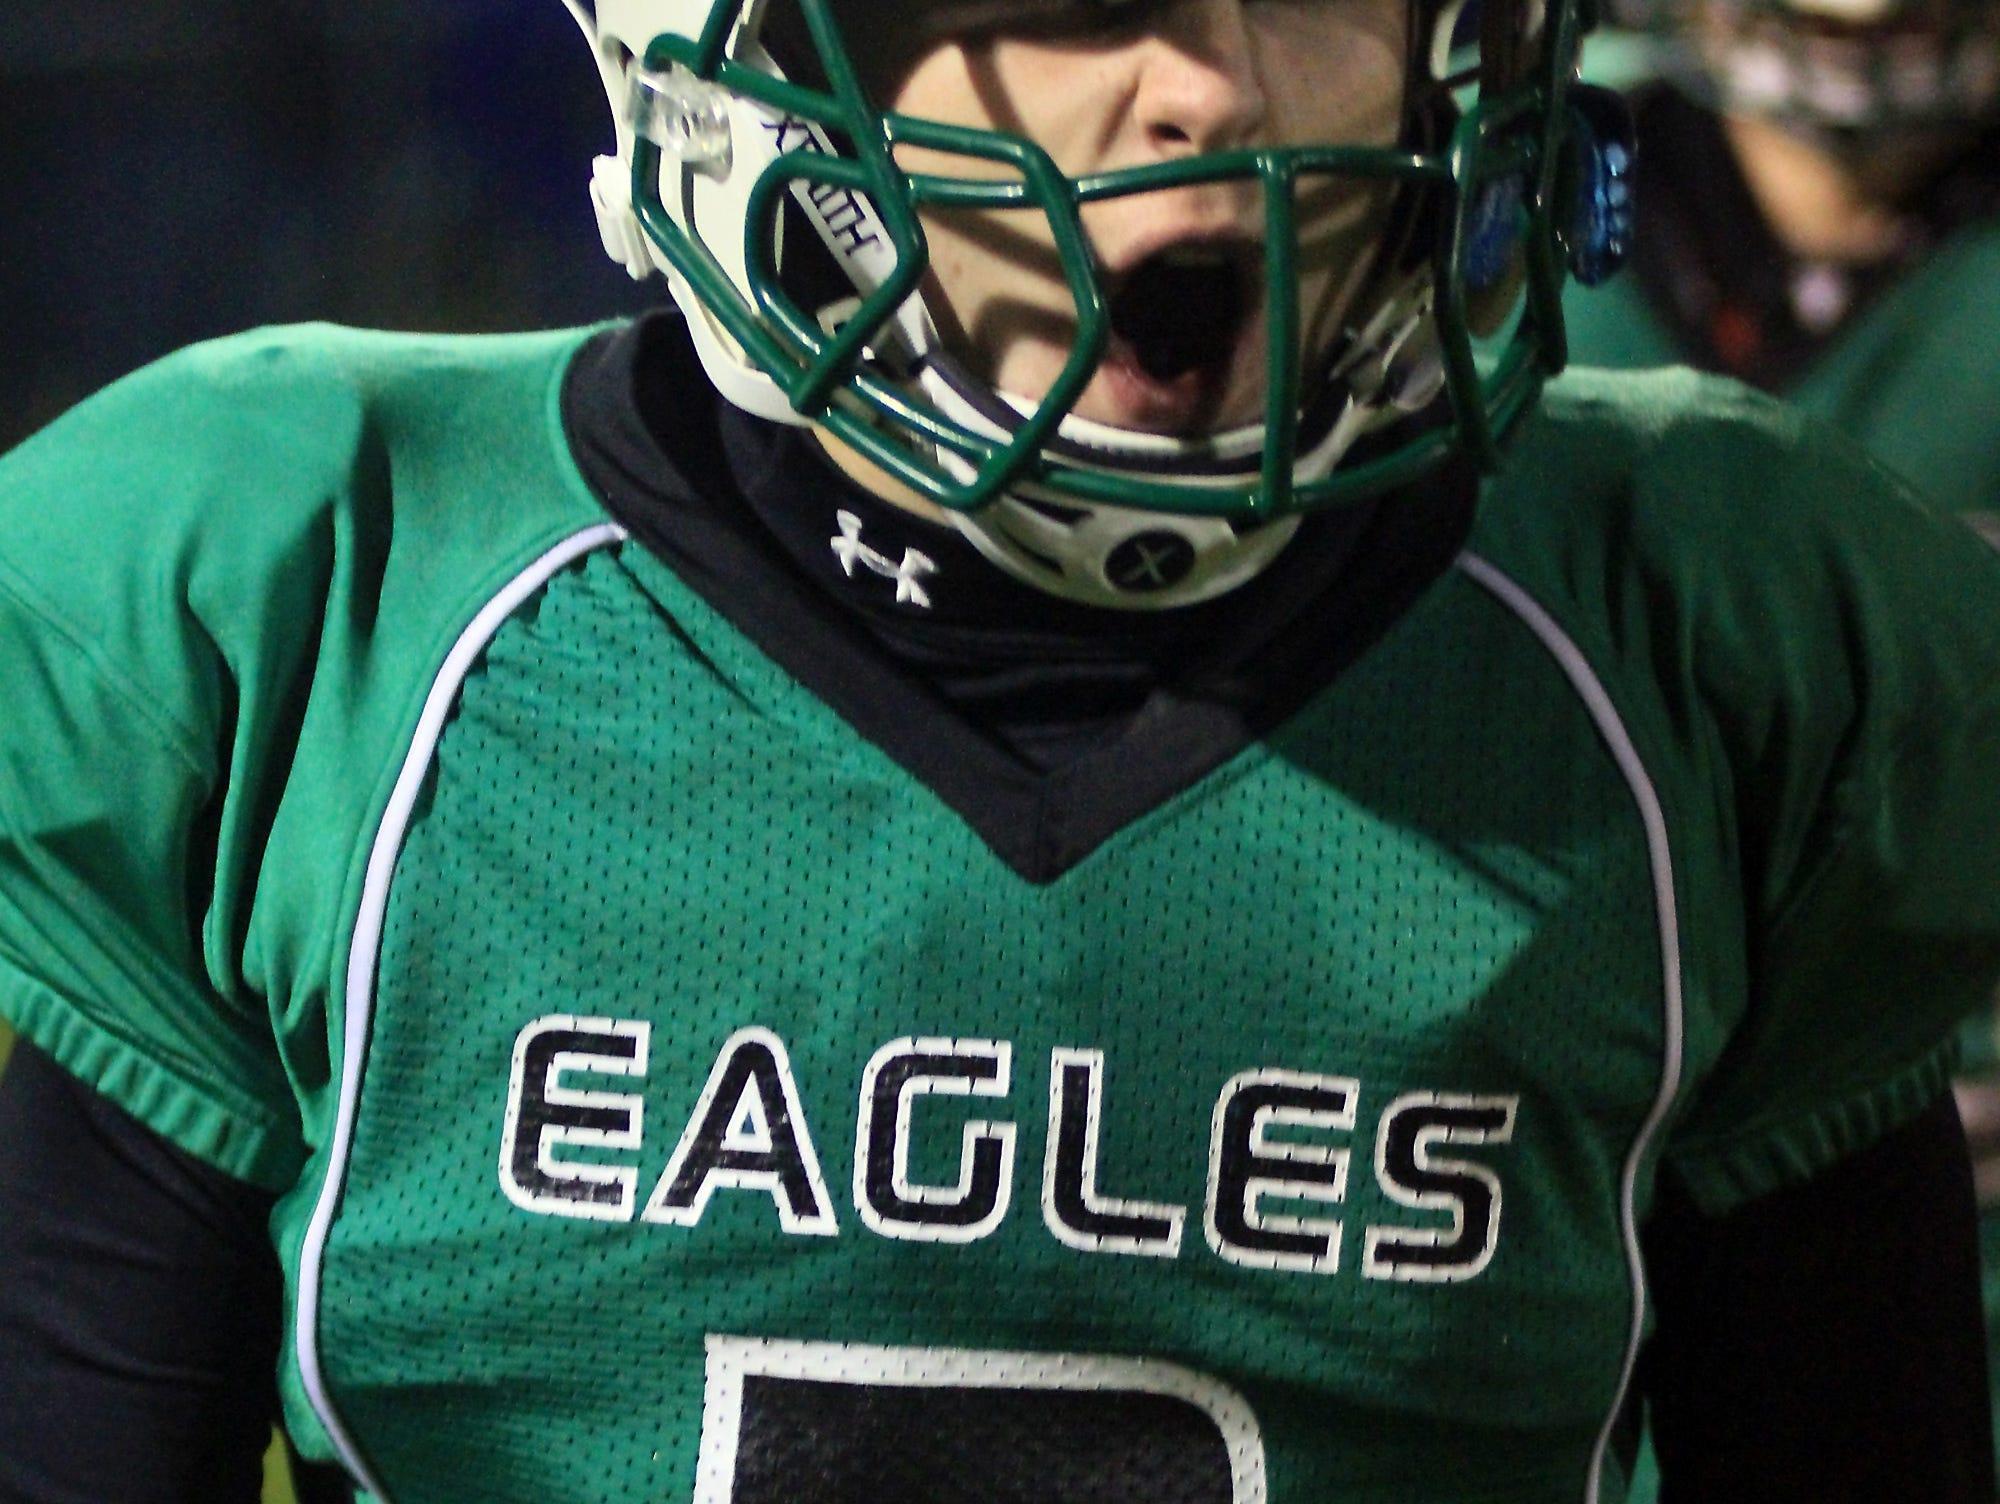 Almond-Bancroft junior quarterback Wyatt Richtmyre has been instrumental in the Eagles unbeaten run through Level 2 of the Division 7 playoffs.